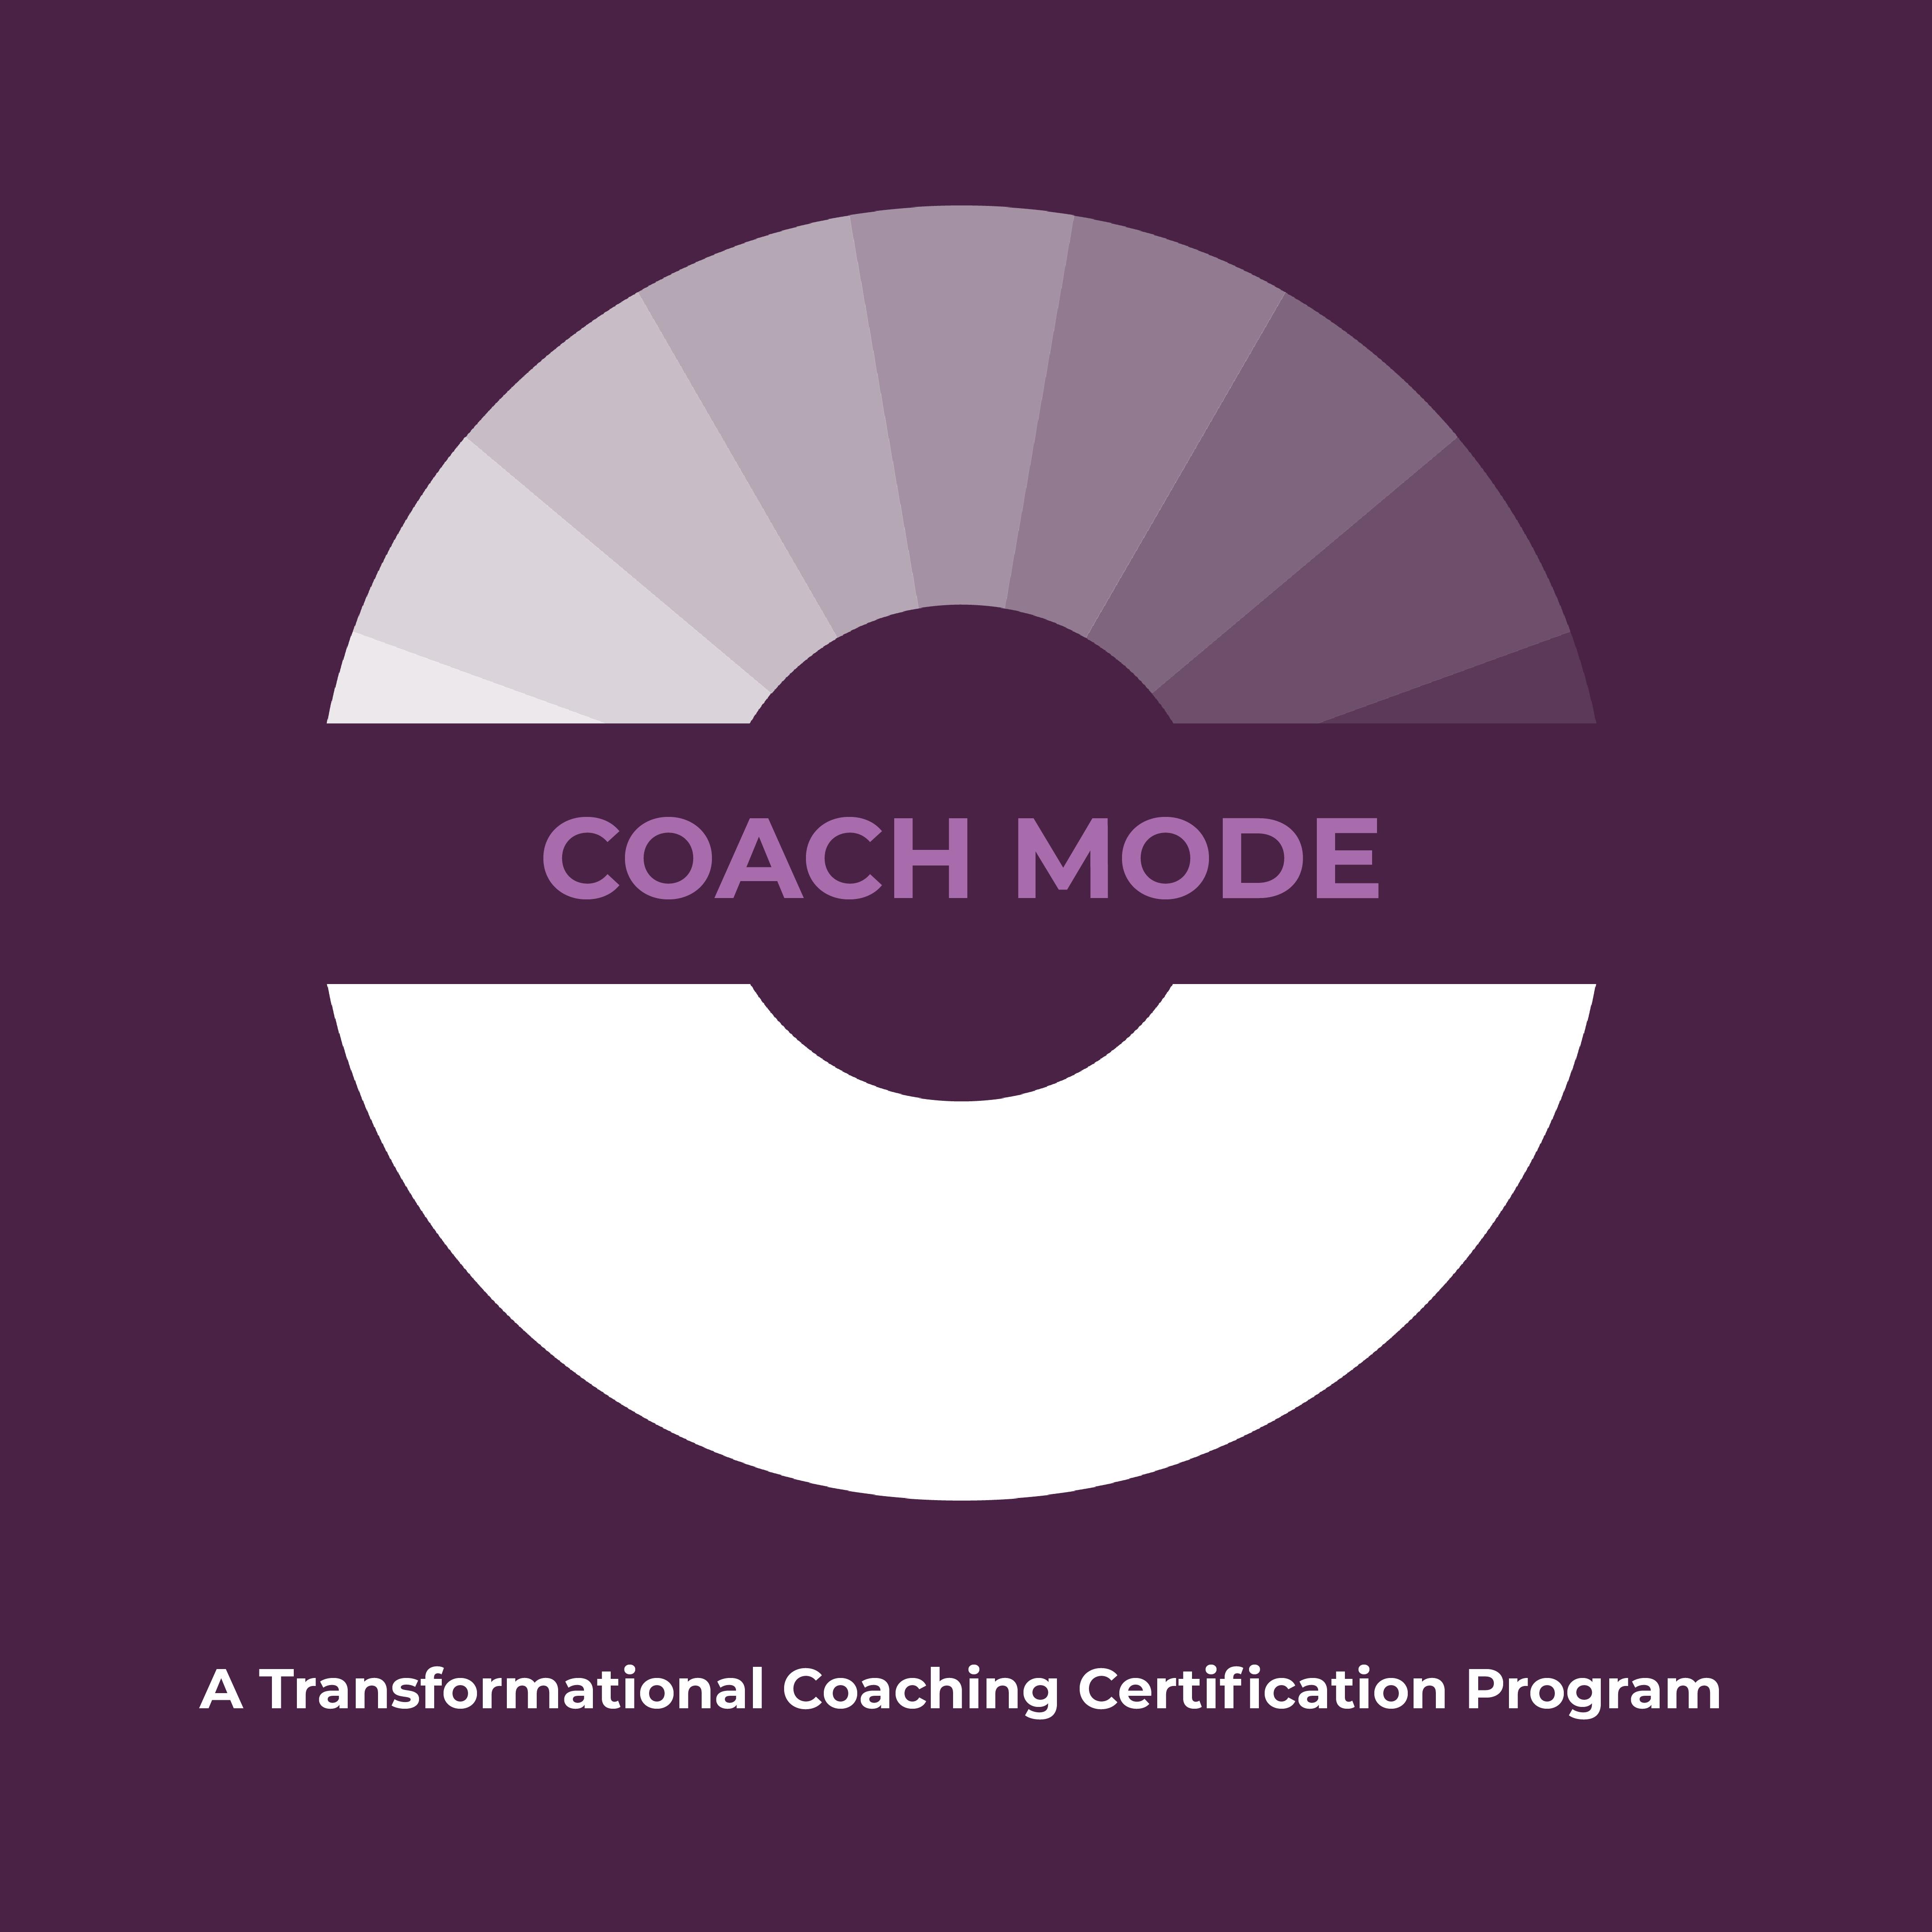 Coach Mode Program image